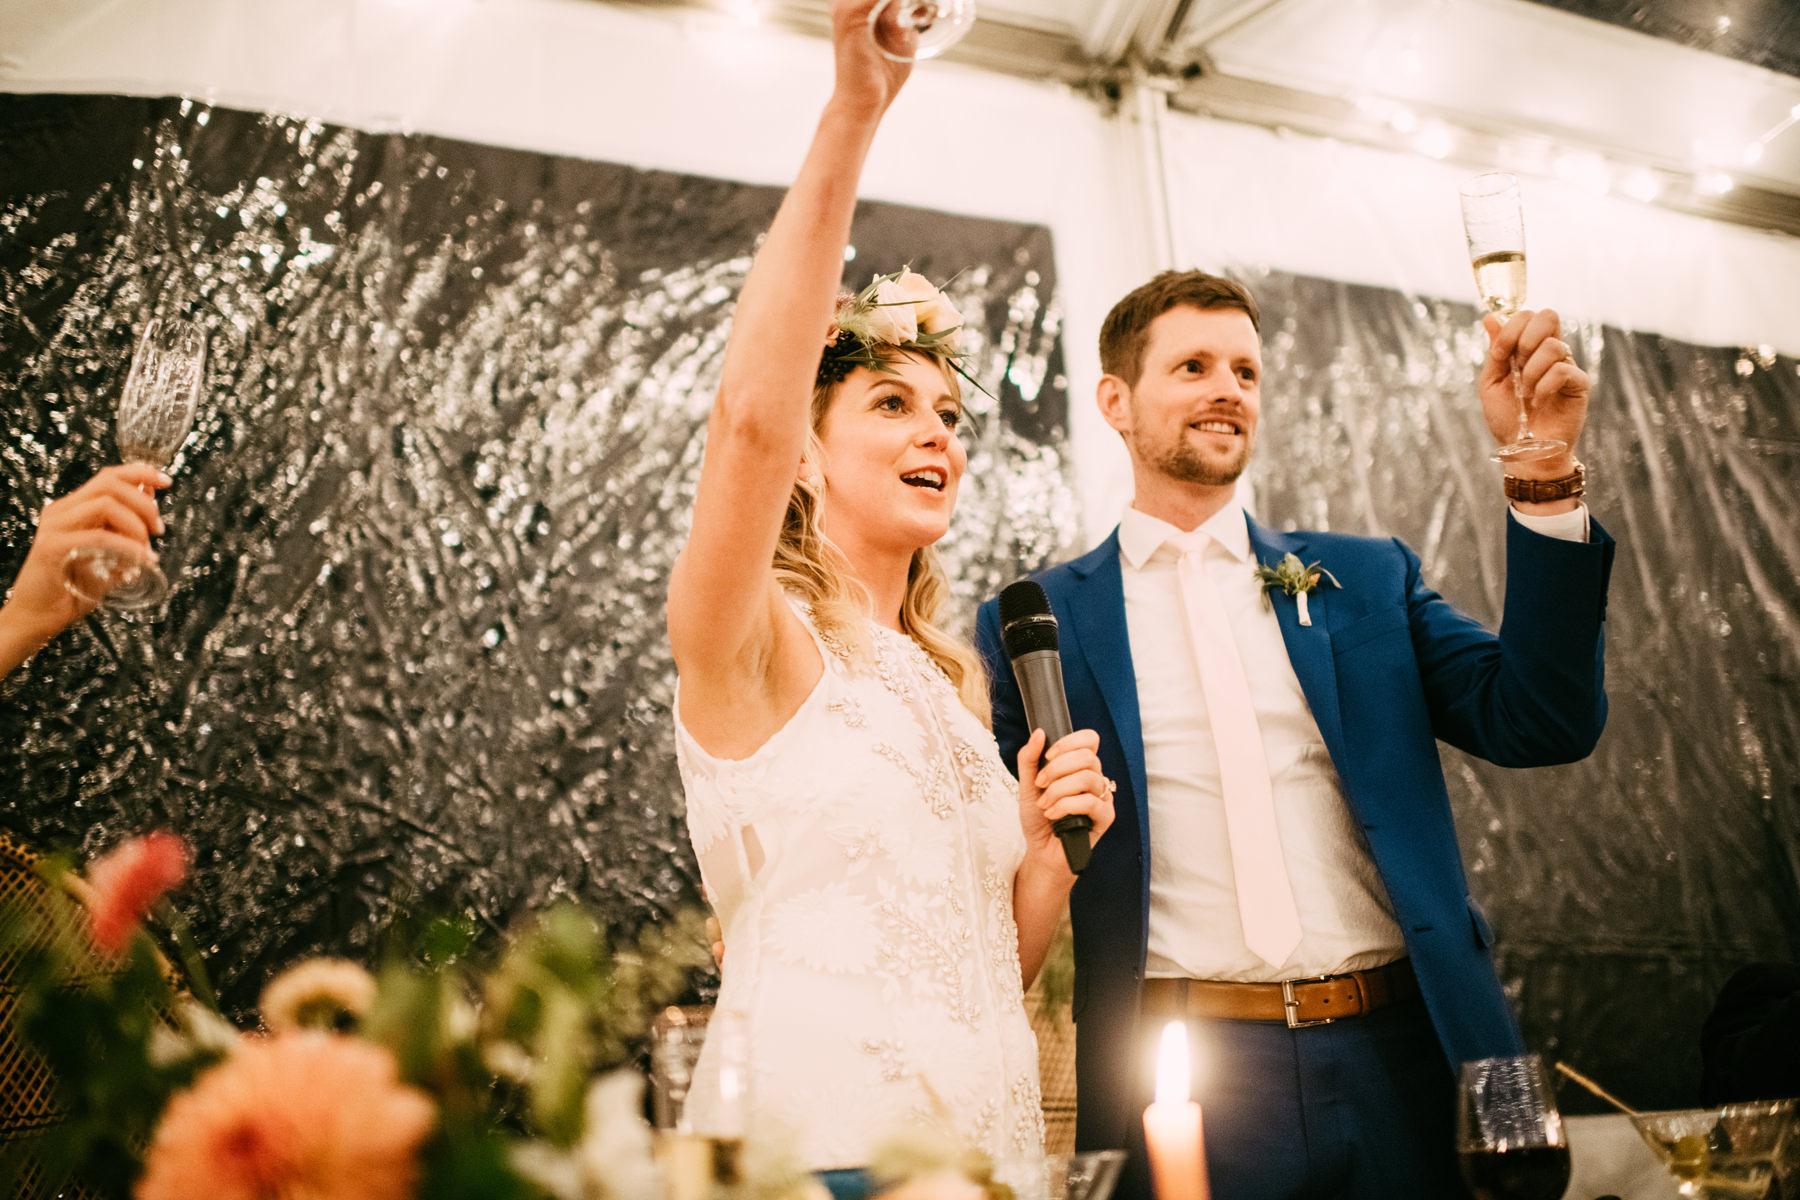 388-colorful-outdoor-lopez-island-wedding.jpg